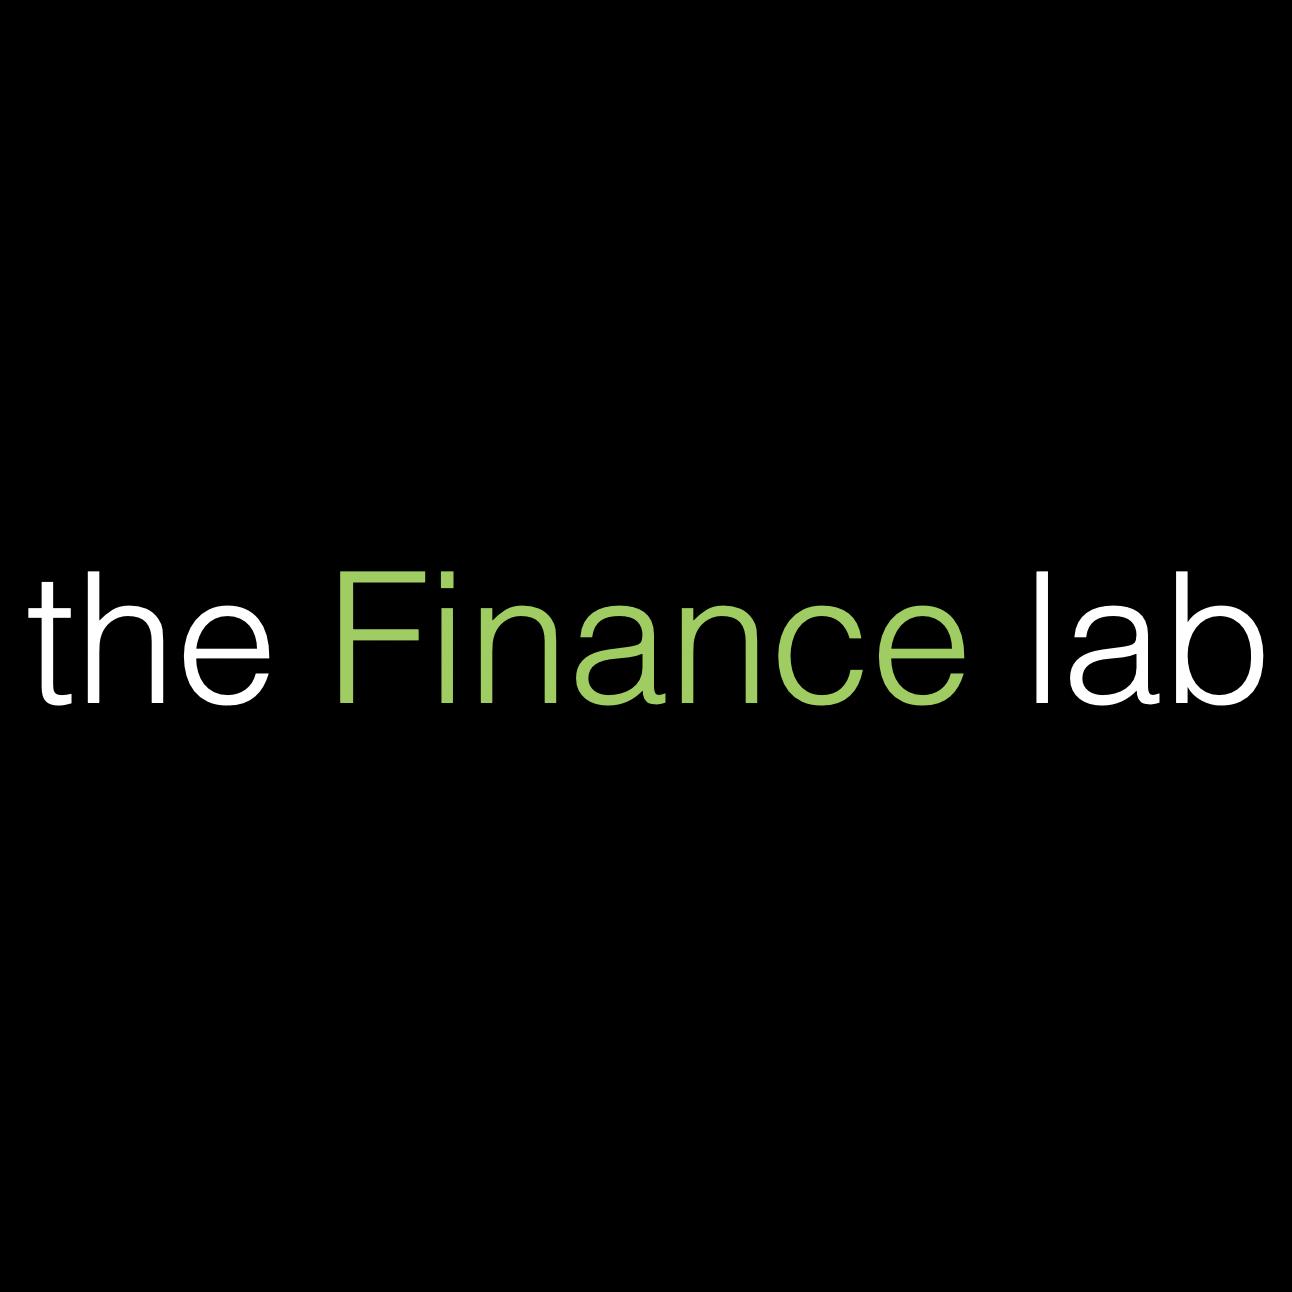 The Finance Lab